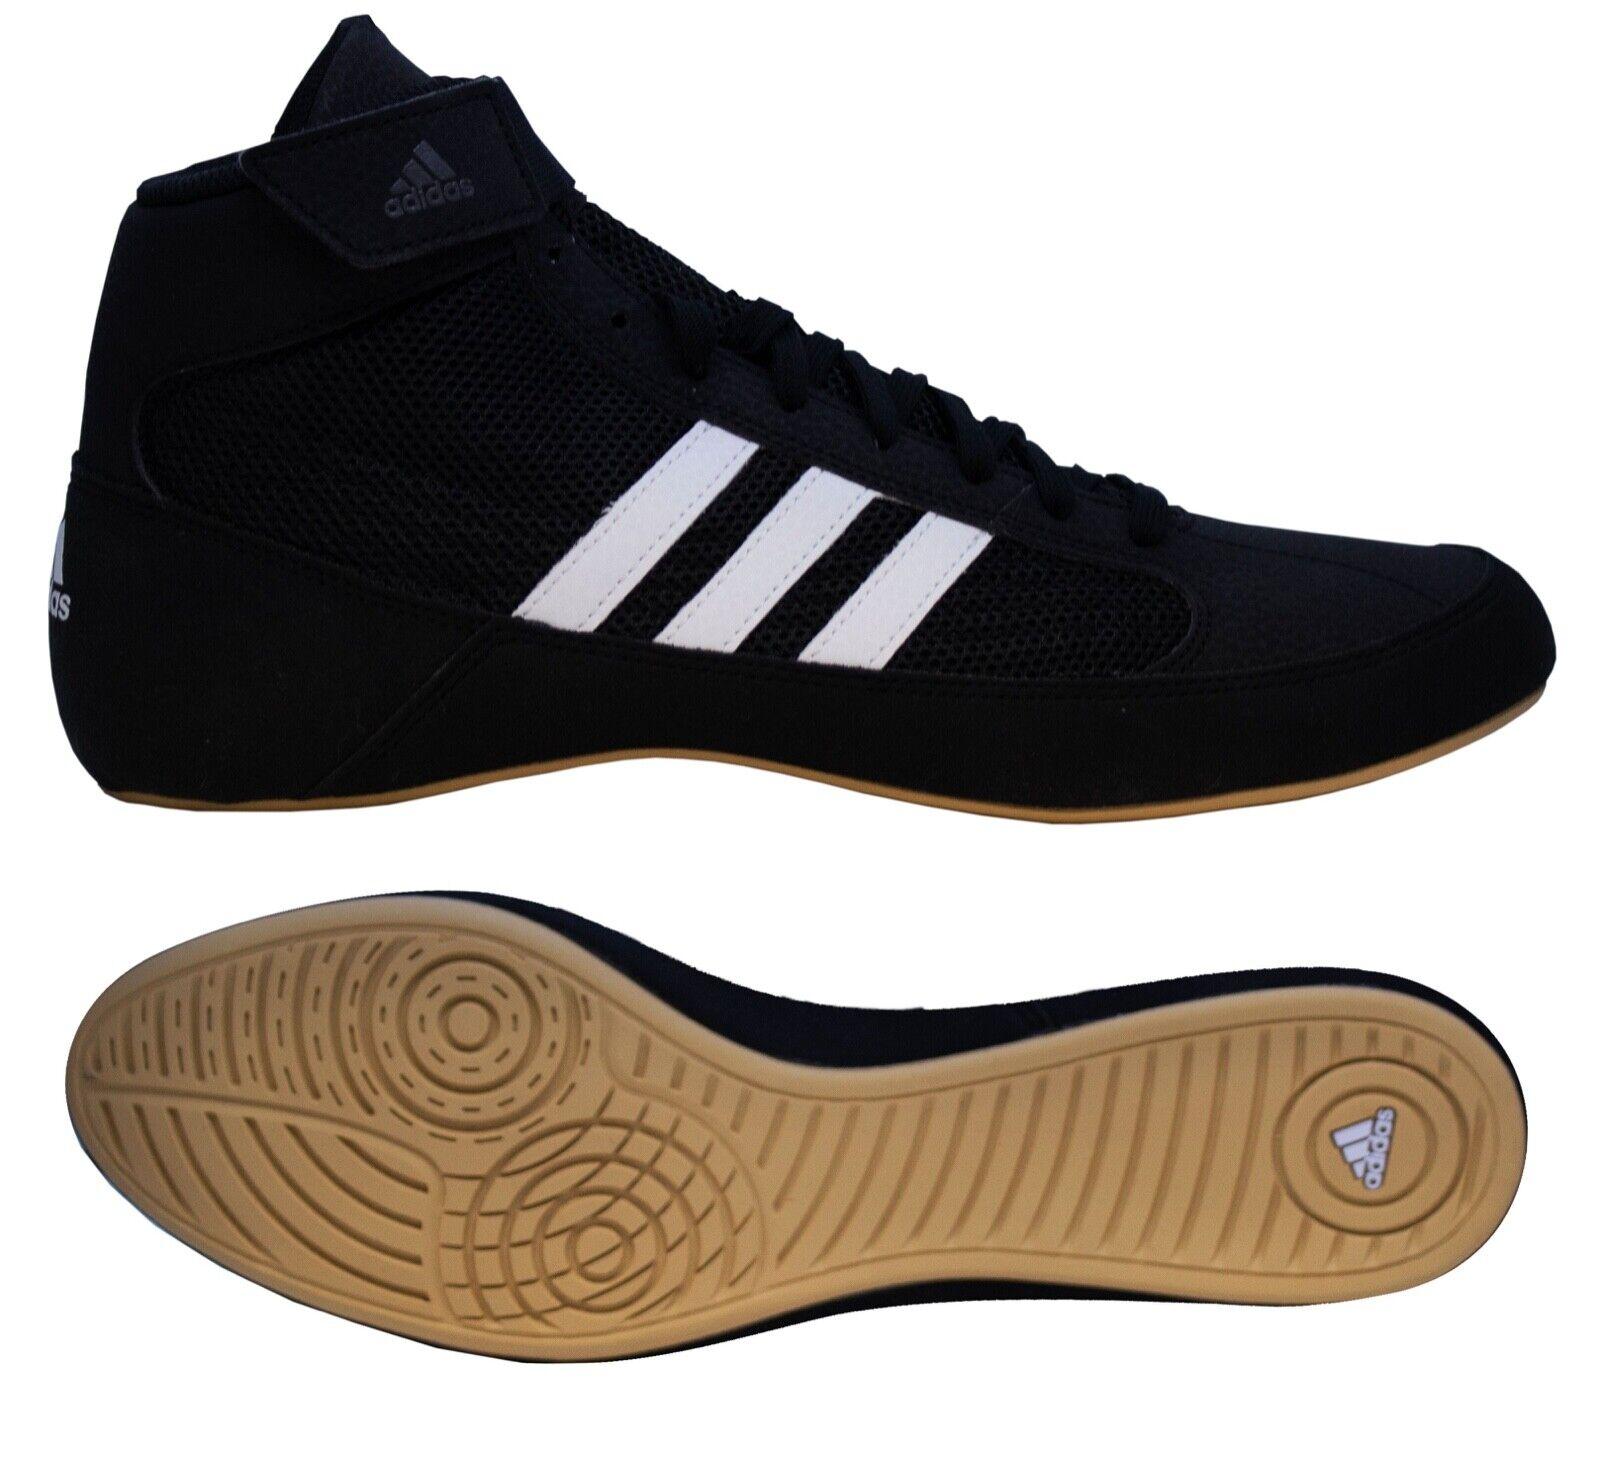 Adidas | AQ3325 | HVC 2 Adult | Black